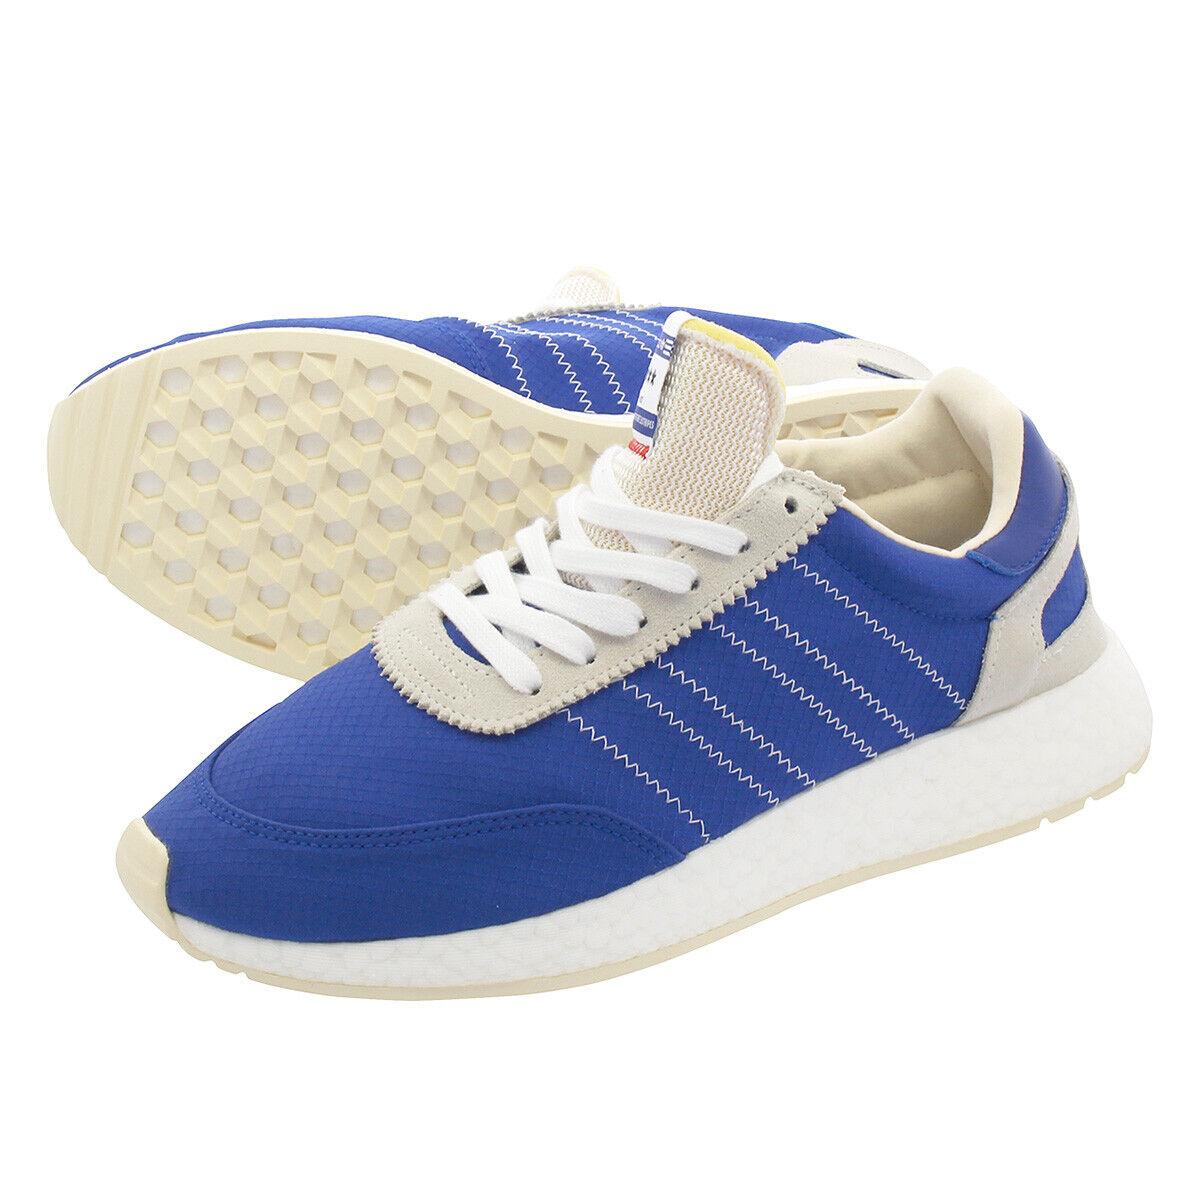 Hummel Stadil High Leder Sneaker Turnschuhe Sportschuhe schwarz 063666-2640 WOW